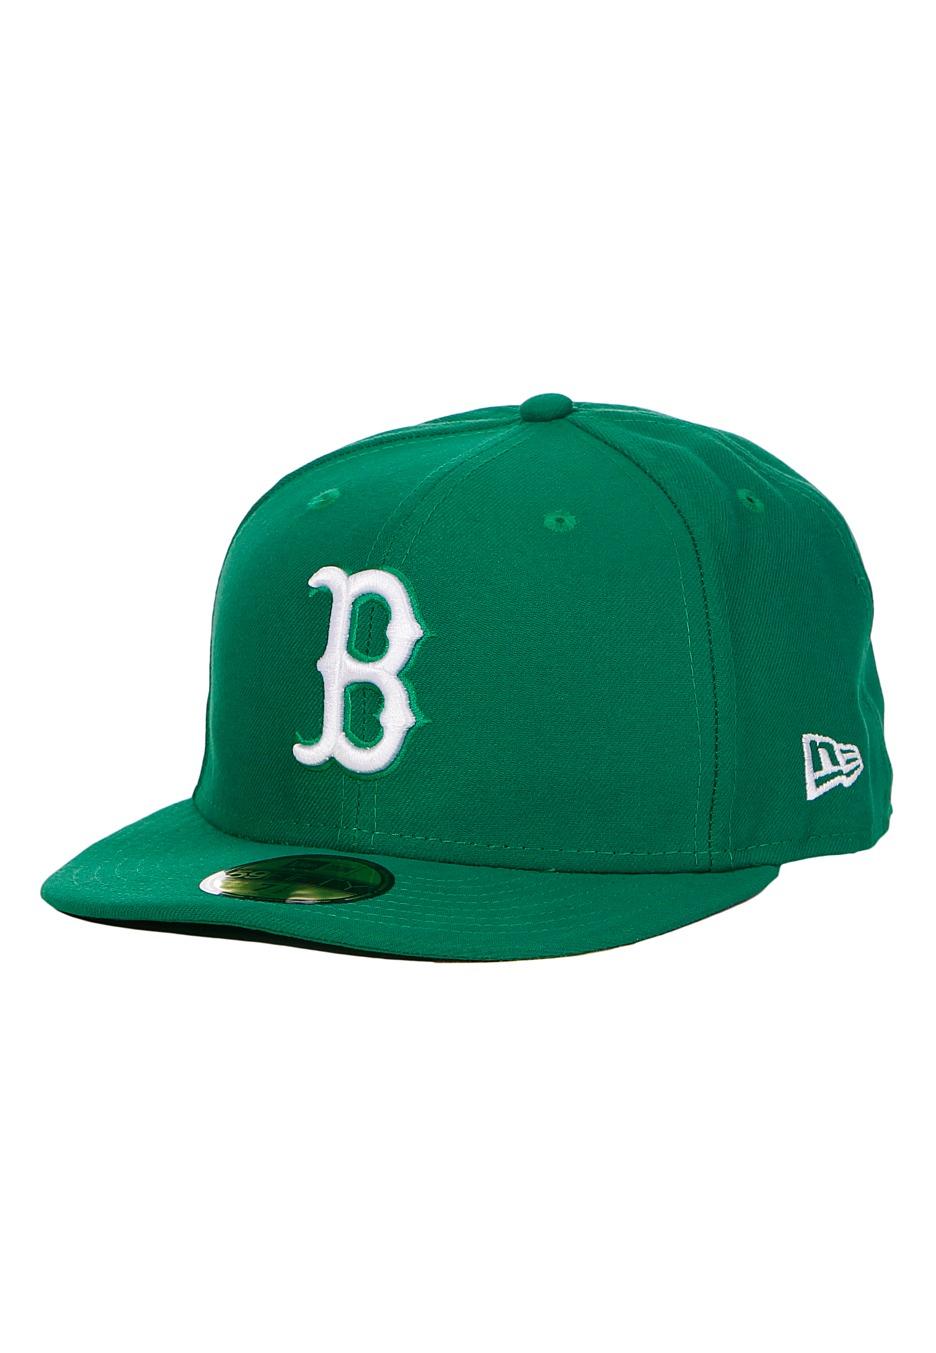 9130191e41bd9 New Era - League Basic MLB Boston Red Sox Kelly White - Cap - Streetwear  Shop - Impericon.com Worldwide